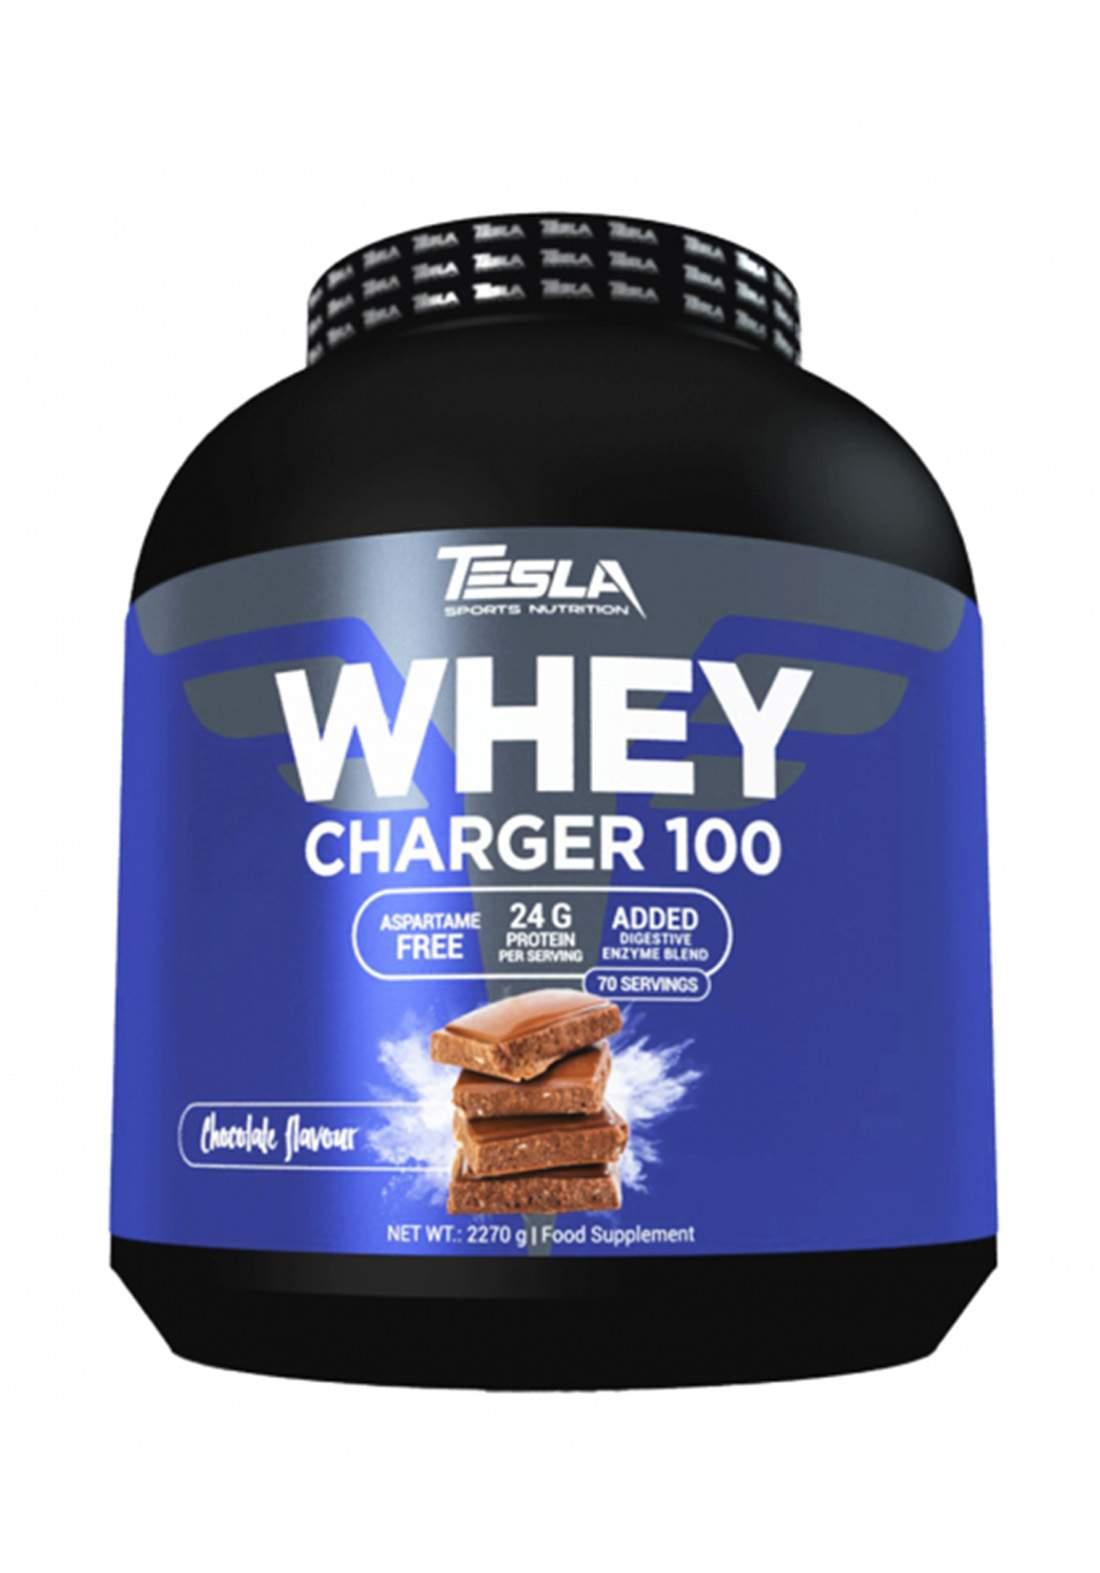 Tesla Whey Charger 100 Chocolate Flavor 2270g بروتين بنكهة الشوكولاتة